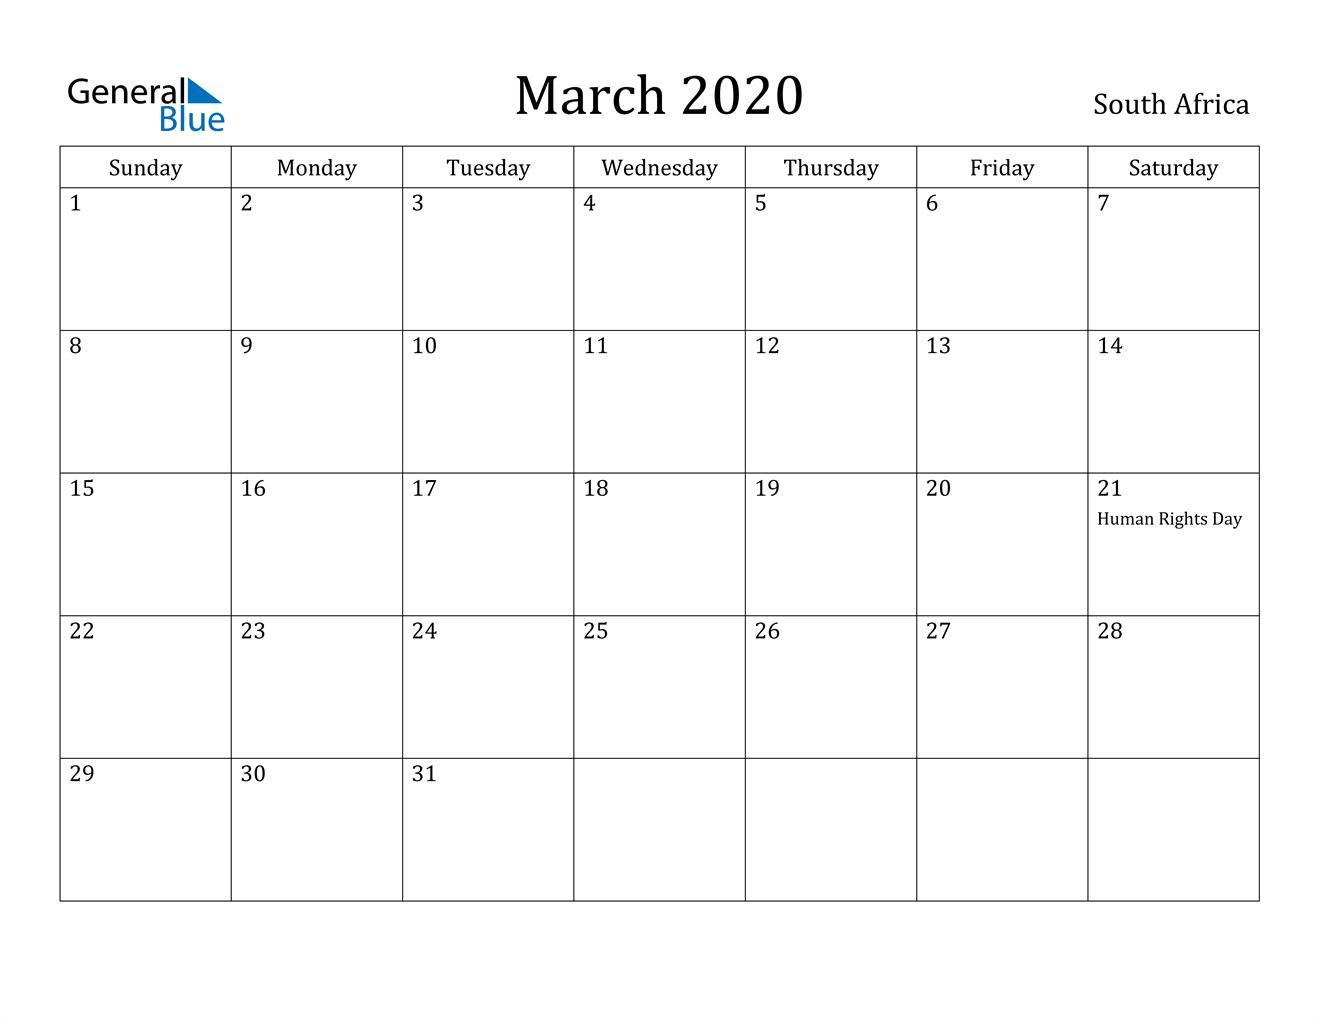 March 2020 Calendar - South Africa